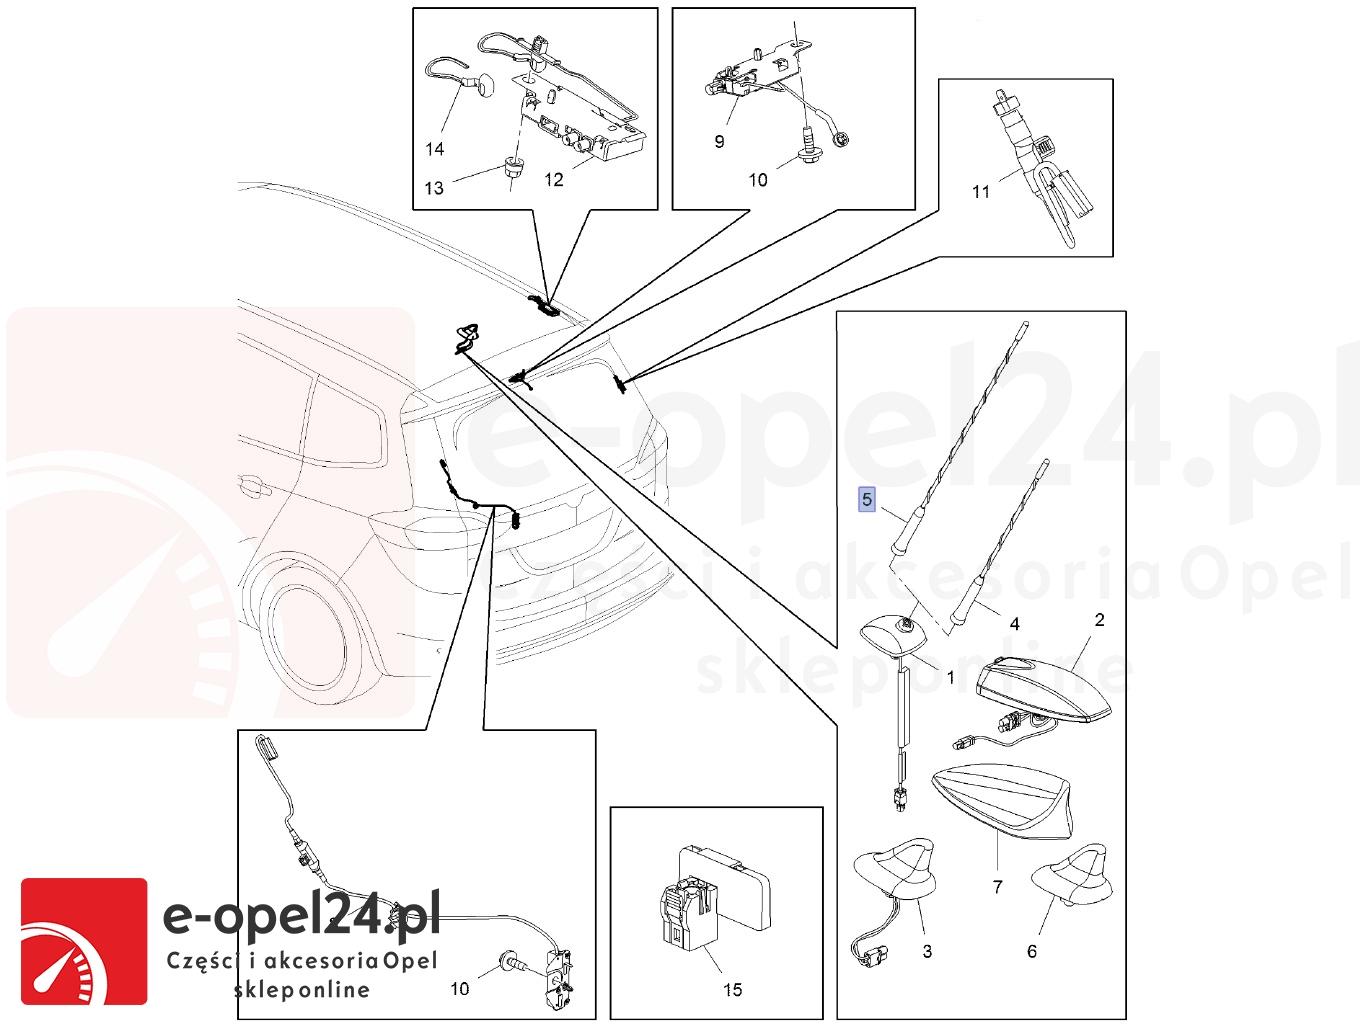 Maszt antenMaszt anteny samochodowej Opel Zafira C - 1784029-13288180 - 406mmy samochodowej opel Zafira C - Maszt anteny samochodowej Opel Insignia - Maszt anteny Opel Astra J 1784029-13288180 - 406mm